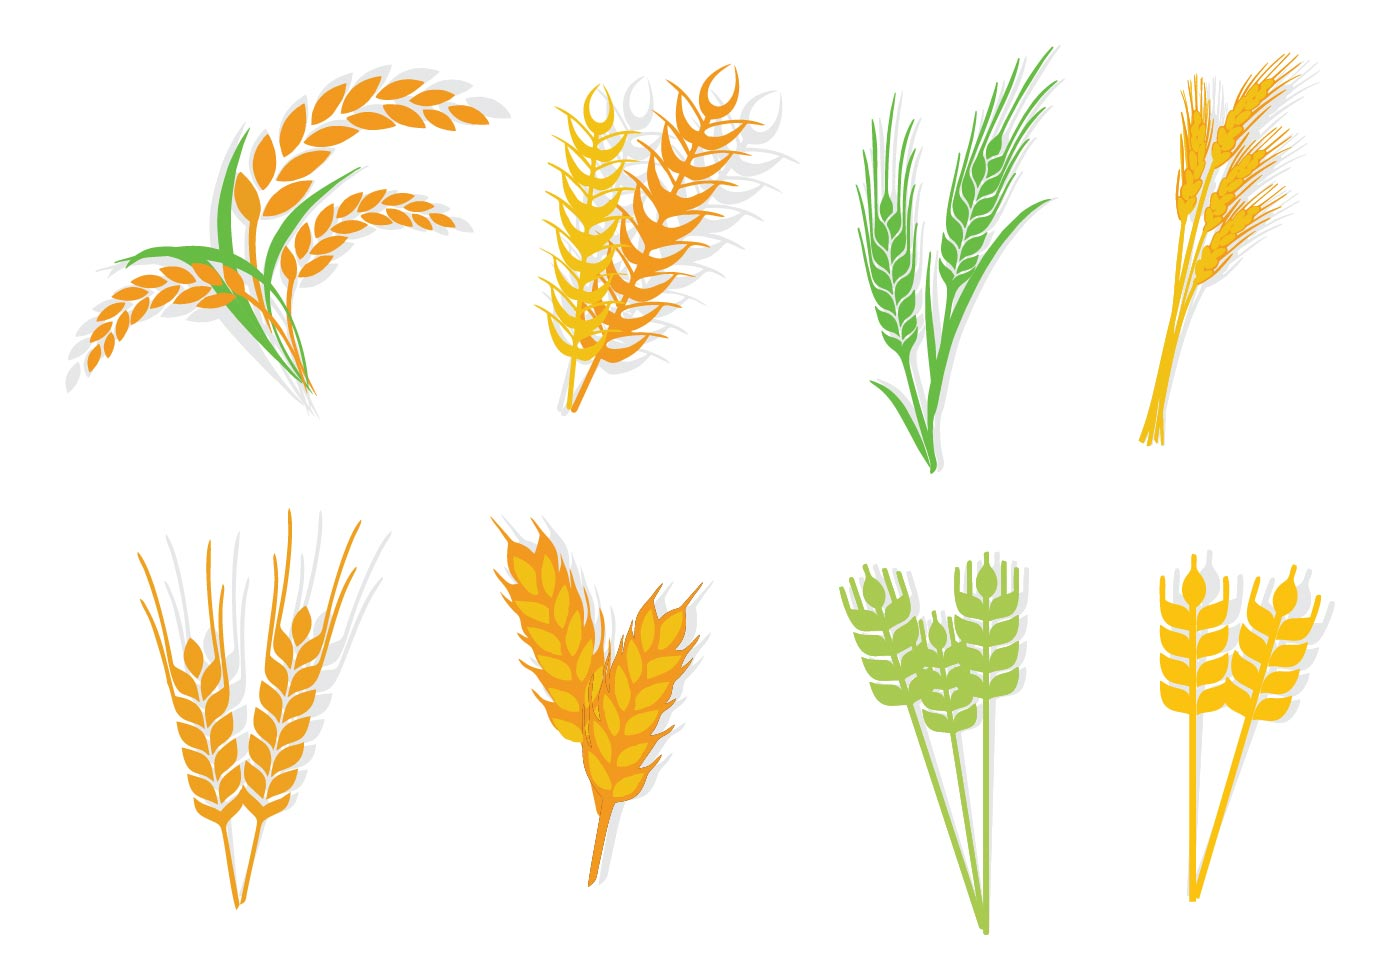 Пшеница рисунок вектор